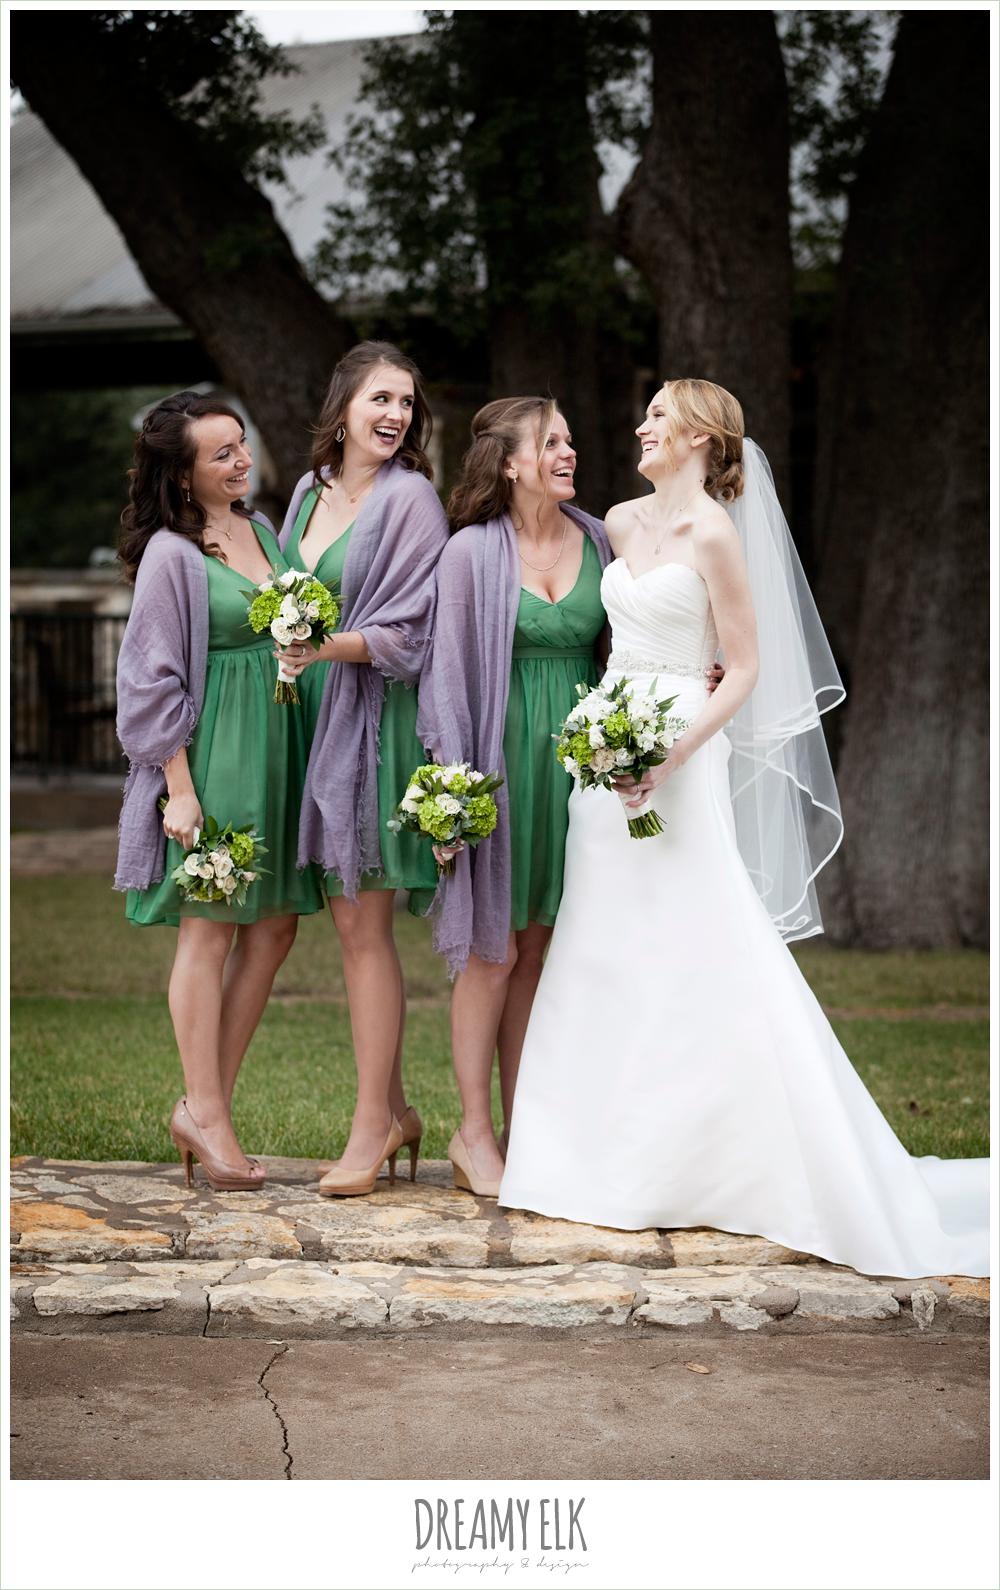 short green bridesmaids dresses, purple shawls, winter vineyard wedding, dreamy elk photography and design